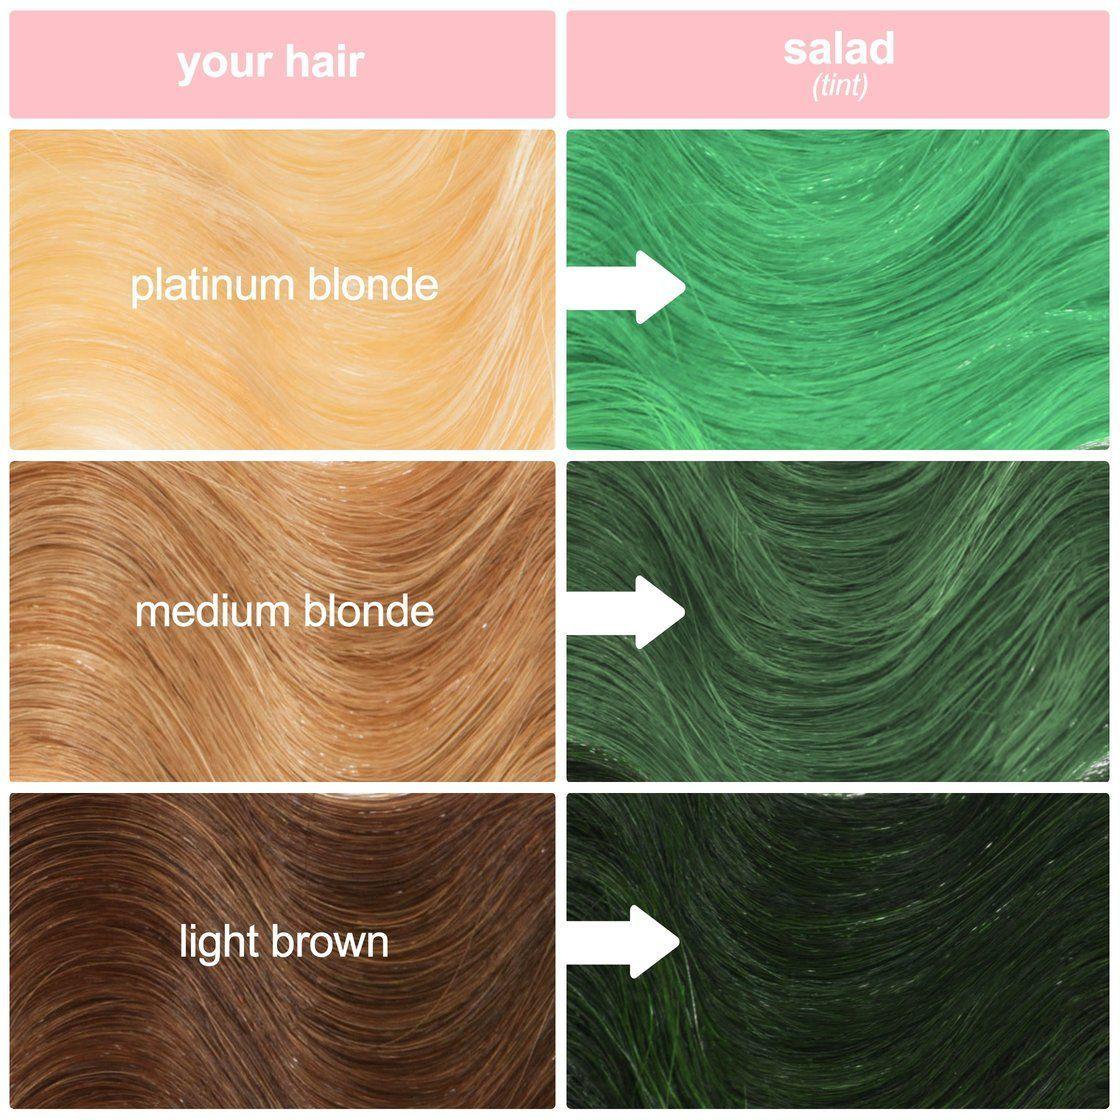 Salad Hair Color Tint Seapunk Green Hair Vitamins In 2019